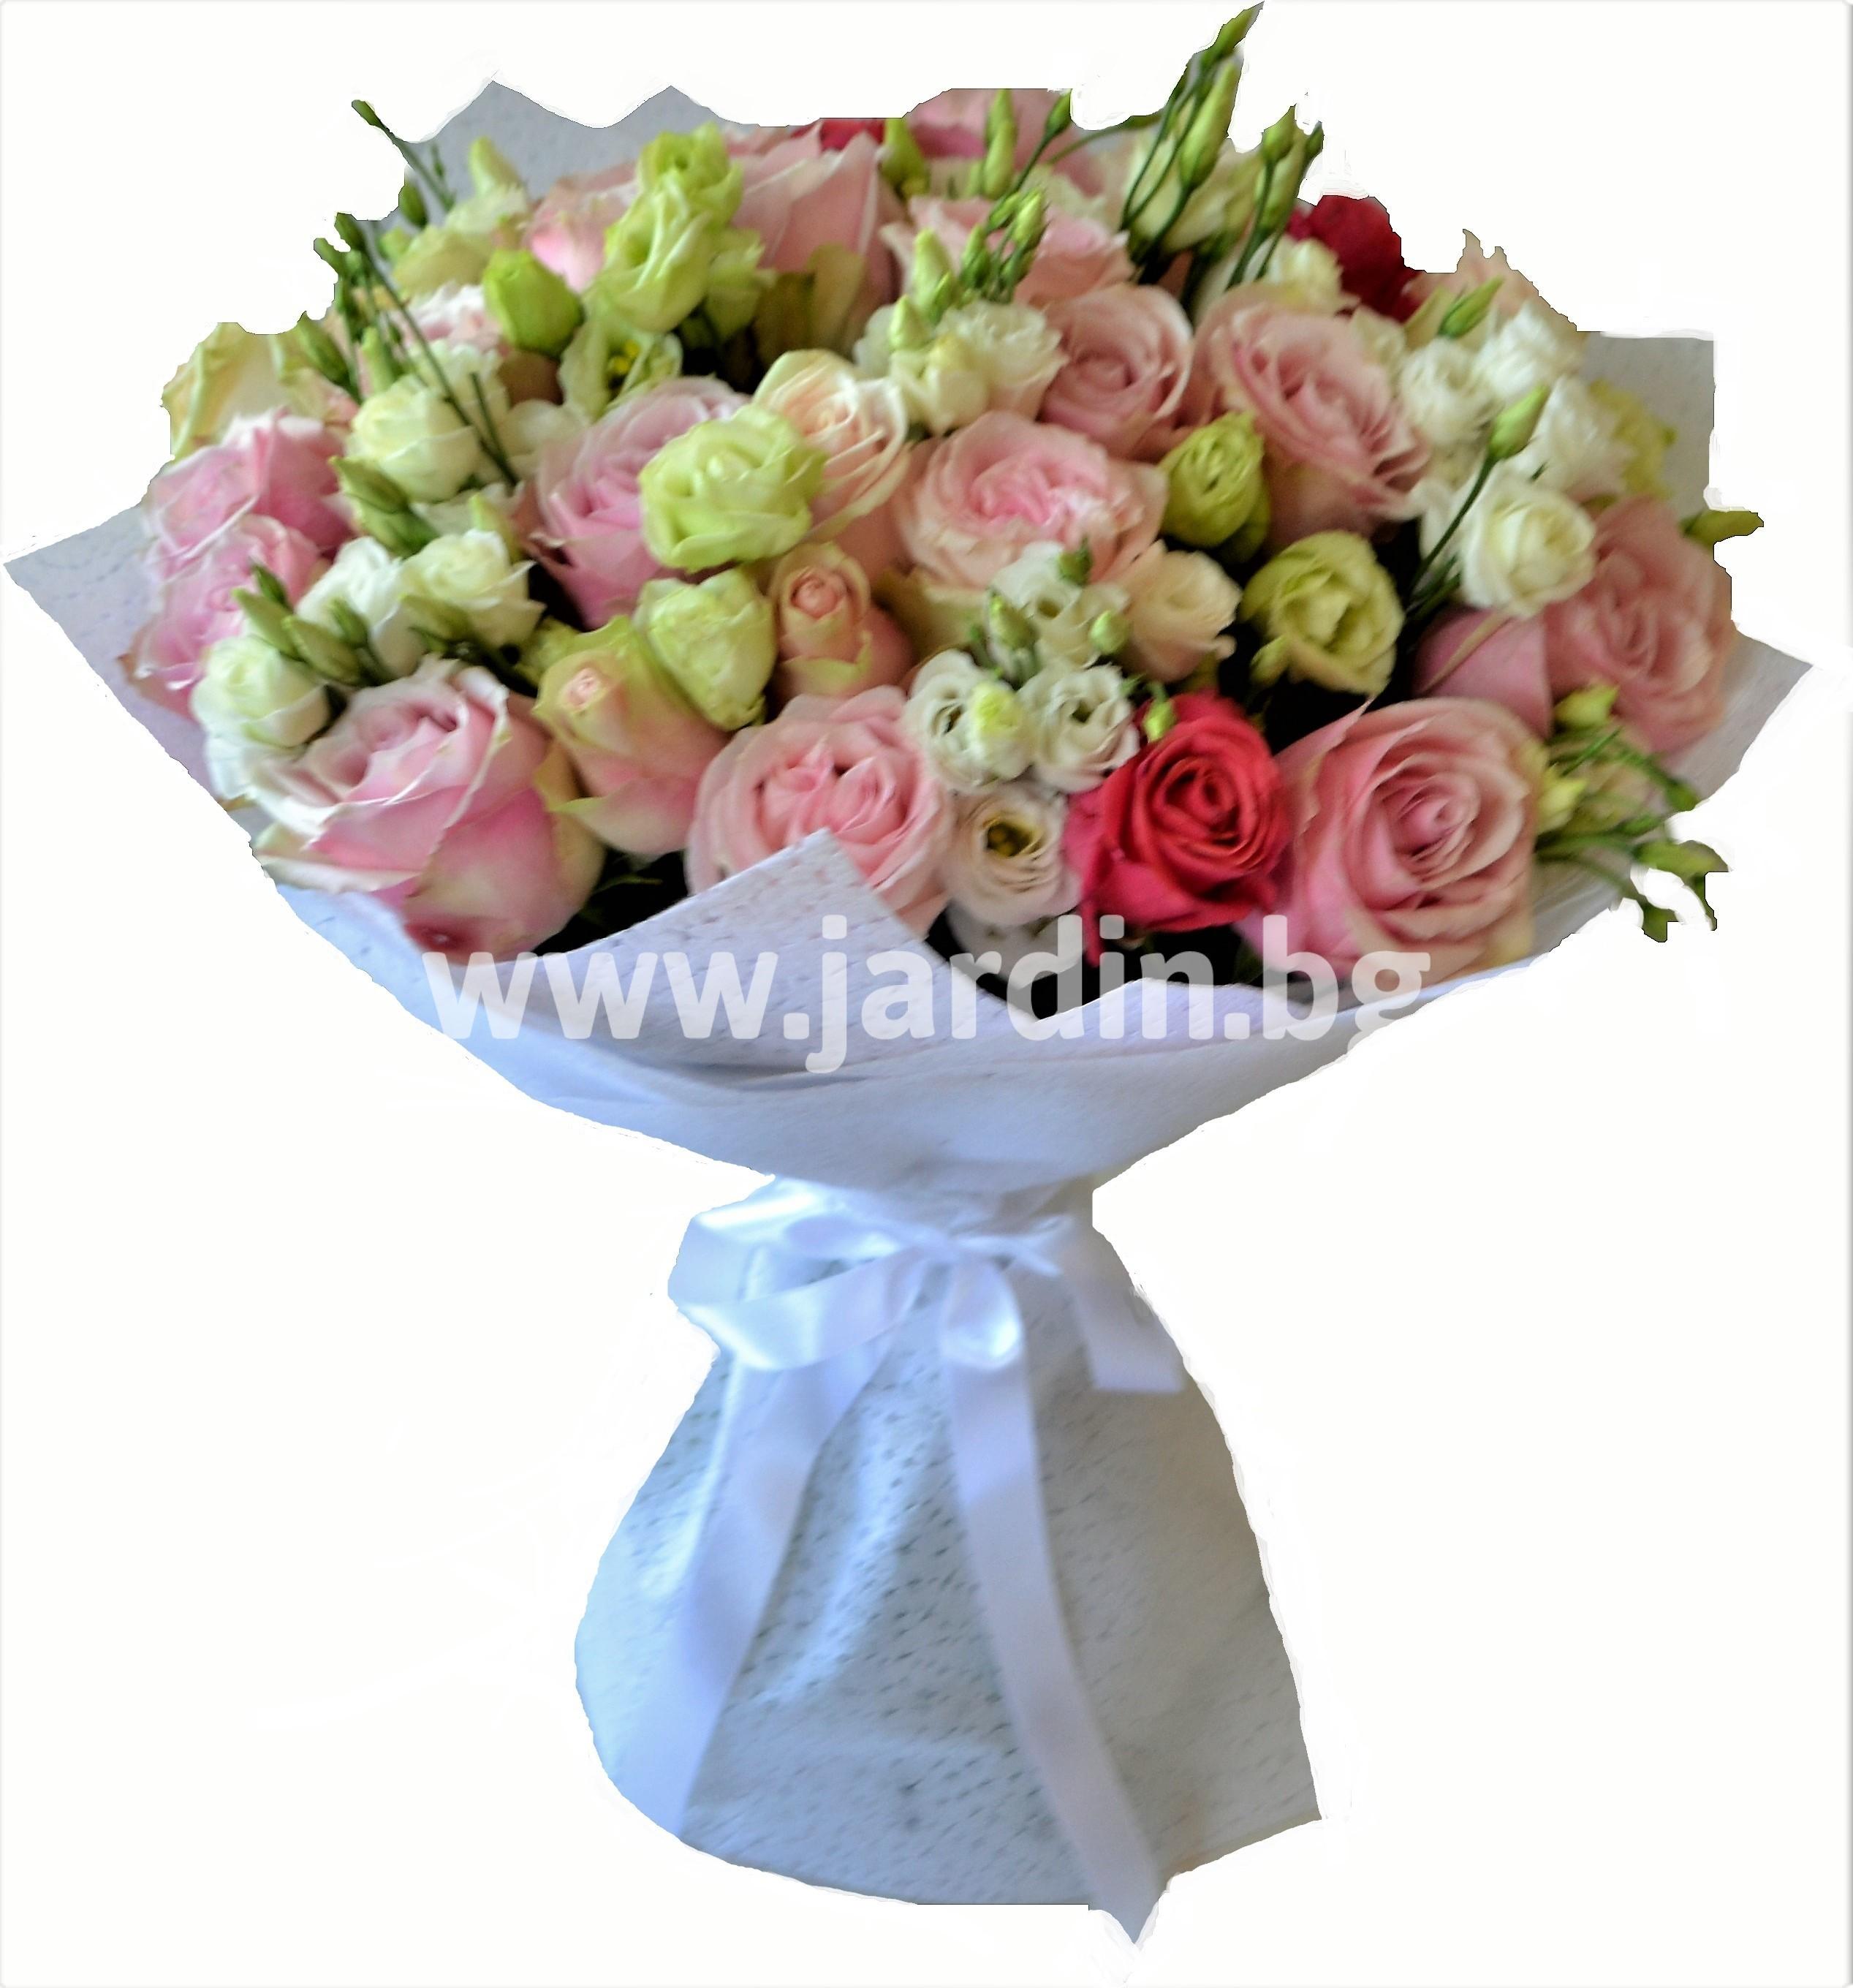 boukuet-roses-eustomas-delivery-burgas (1)